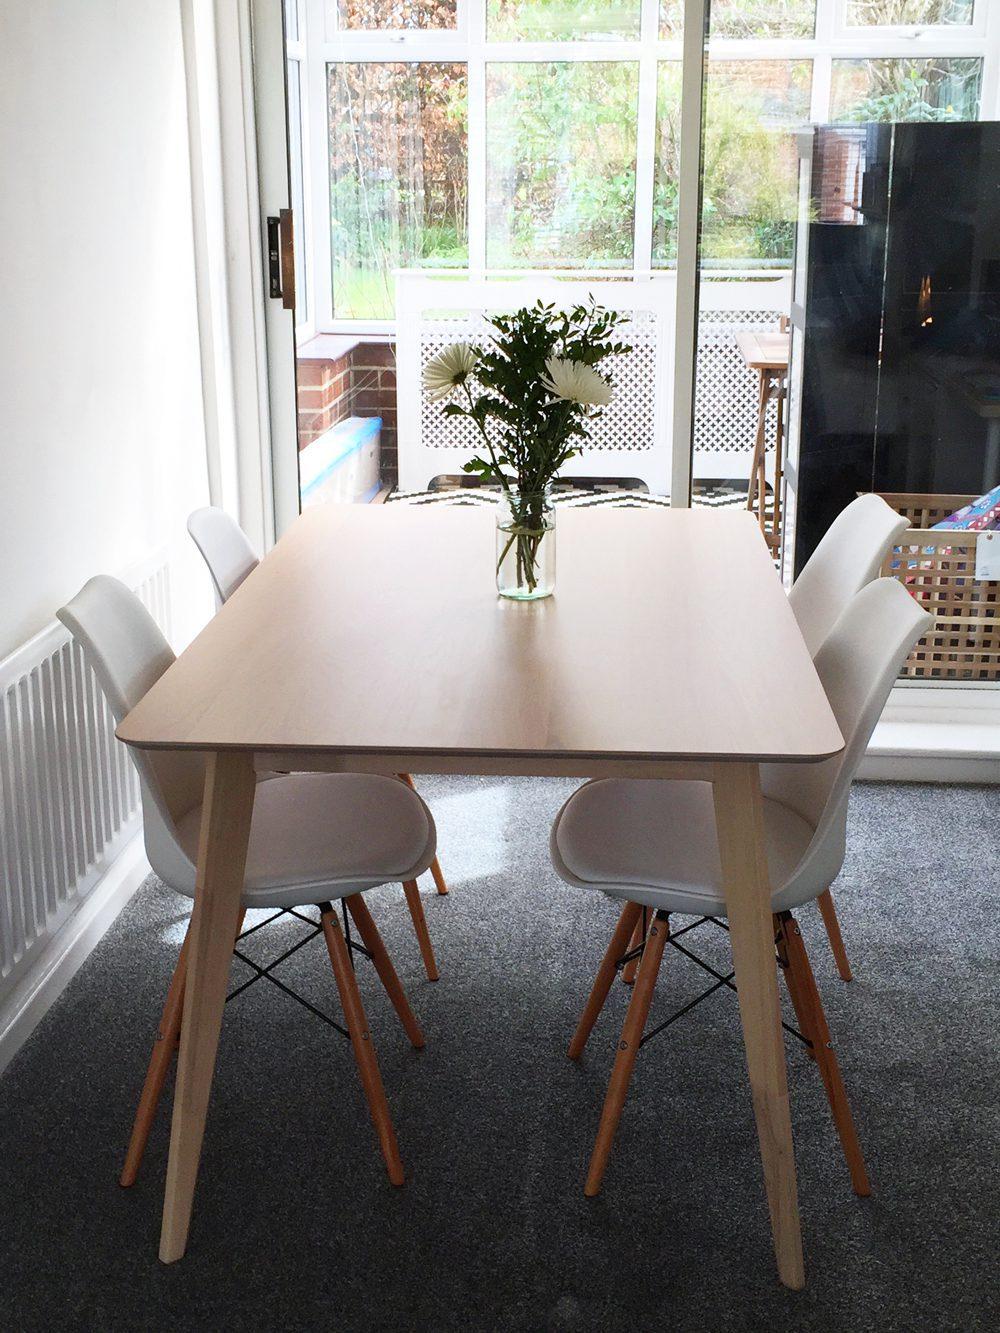 homebase-ferndale-dining-table-11.jpg - Wholeheartedly Laura